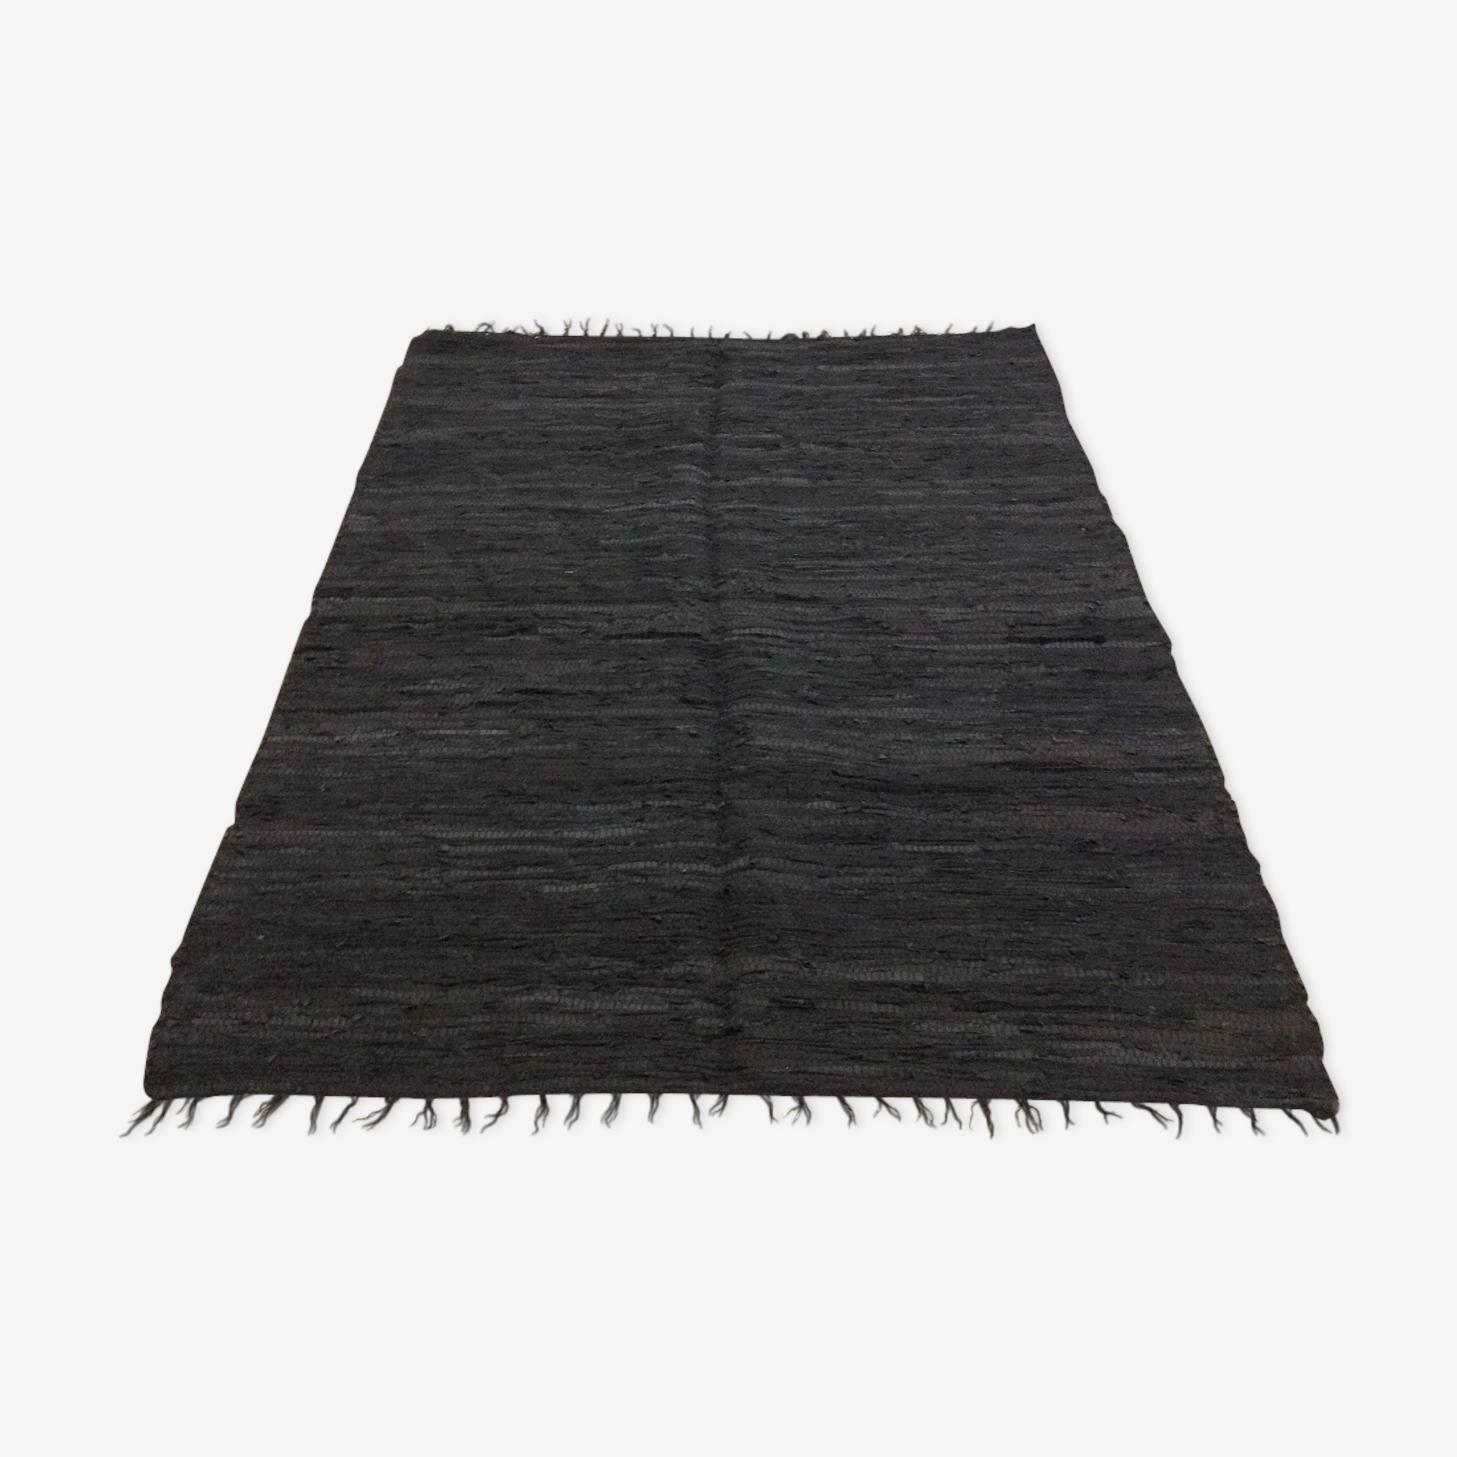 Indian leather carpet 122x184cm